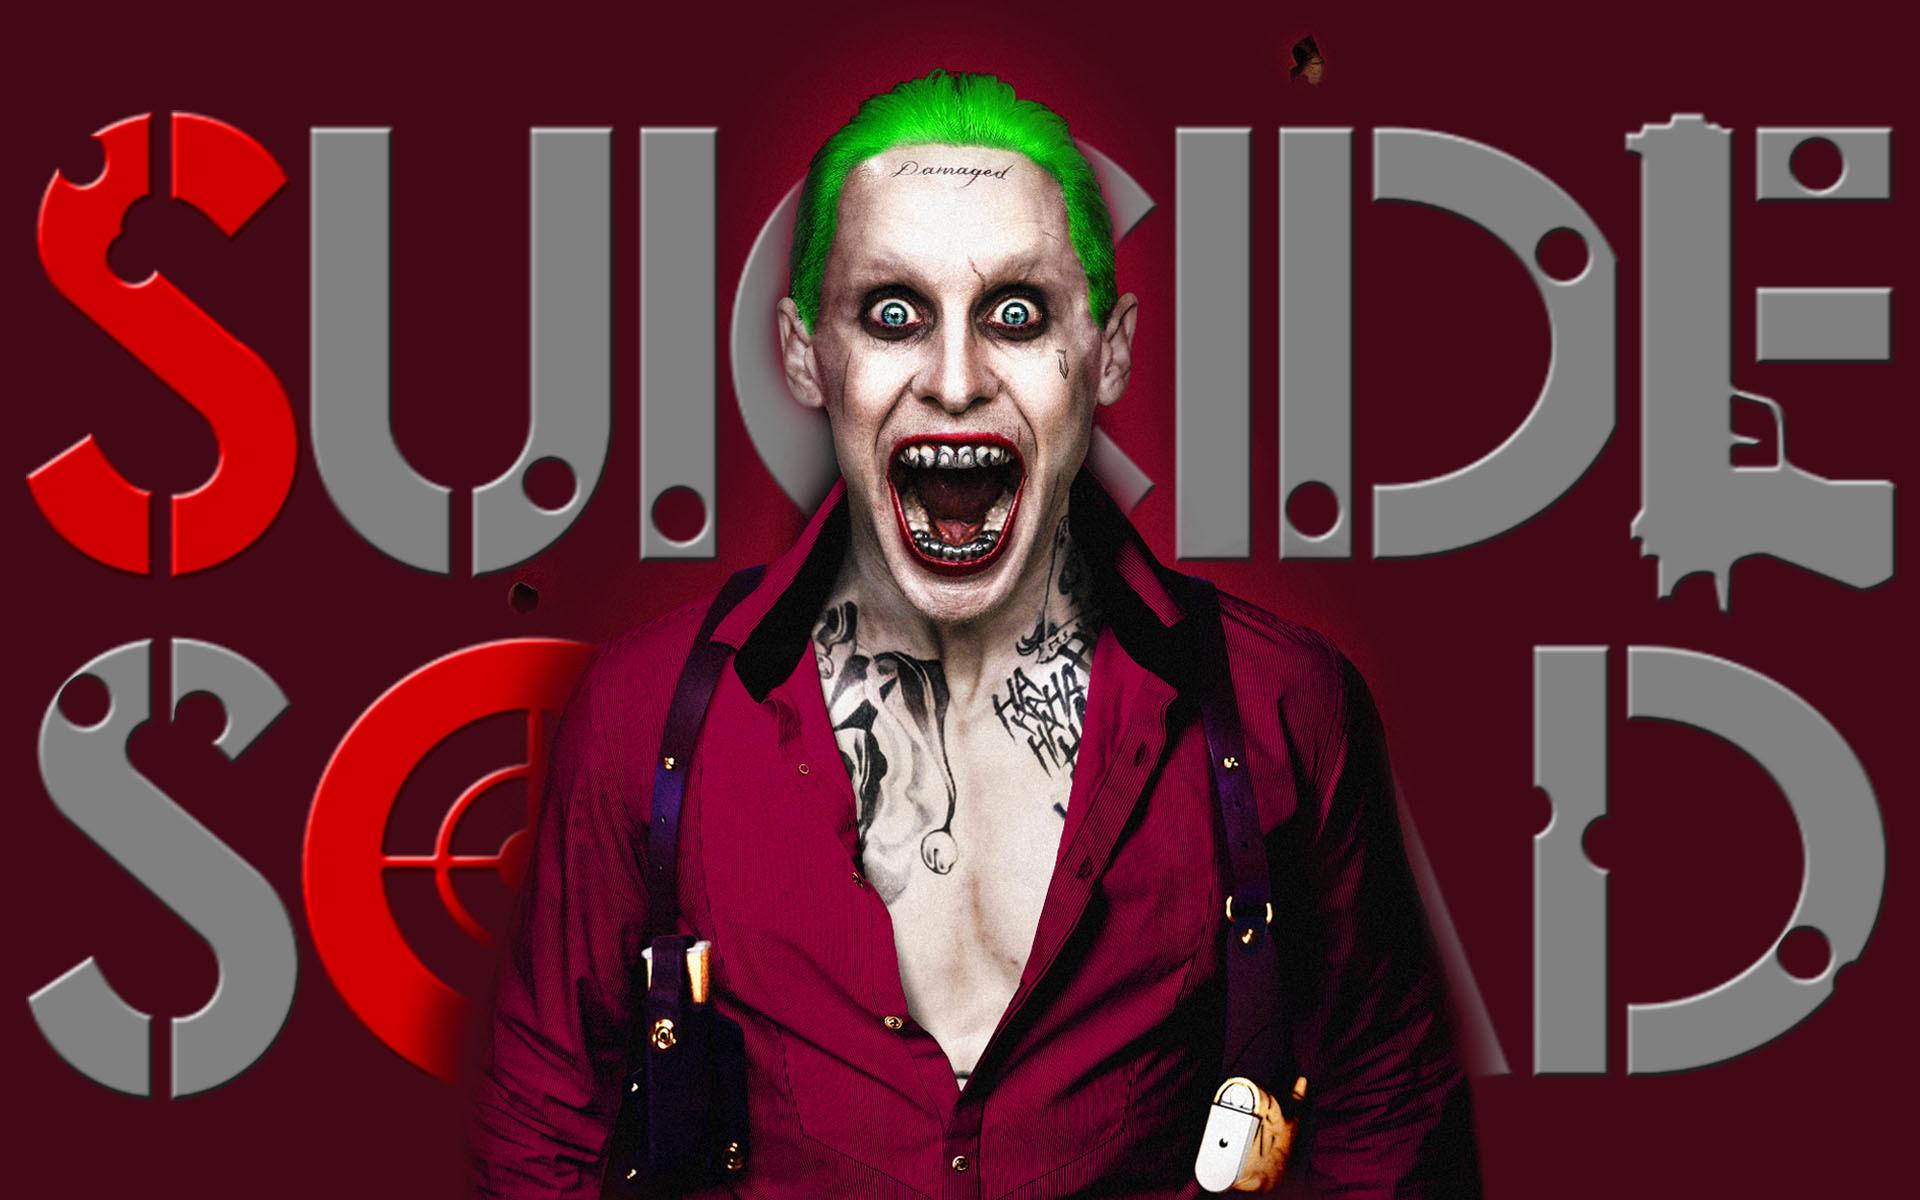 Joker Suicide Squad Wallpapers